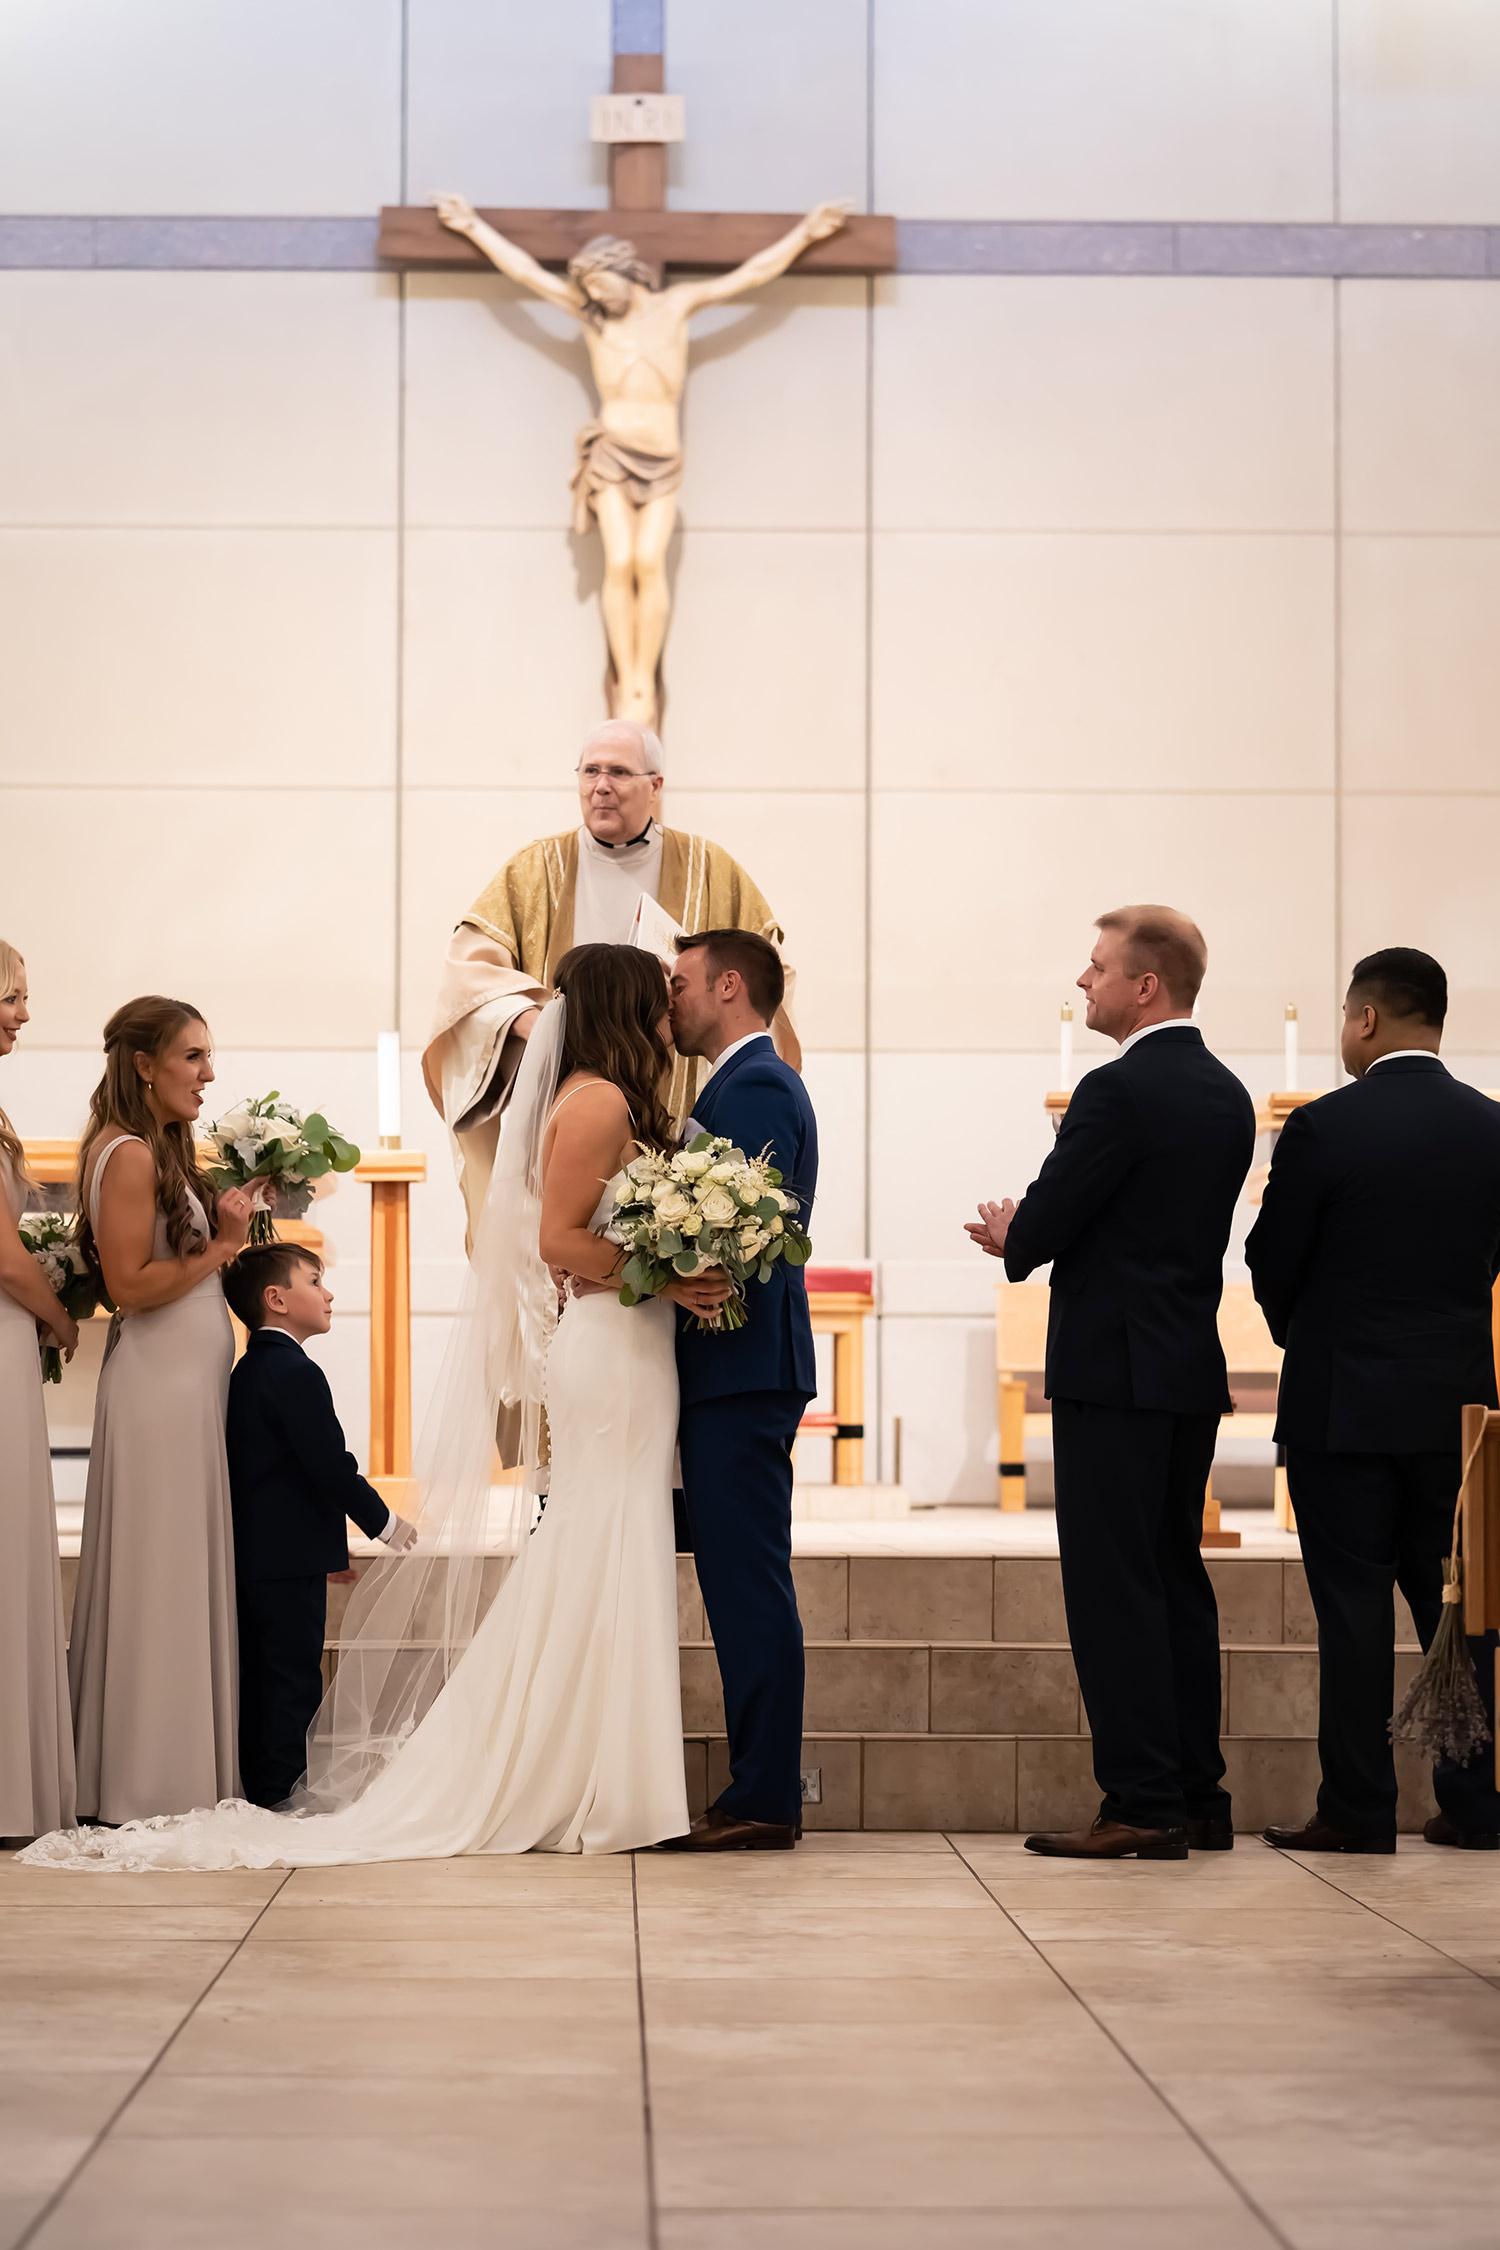 mr-mrs-hull-bride-groom-kissing-st-boniface-church-waukee-desmoines-iowa-raelyn-ramey-photography-347.jpg